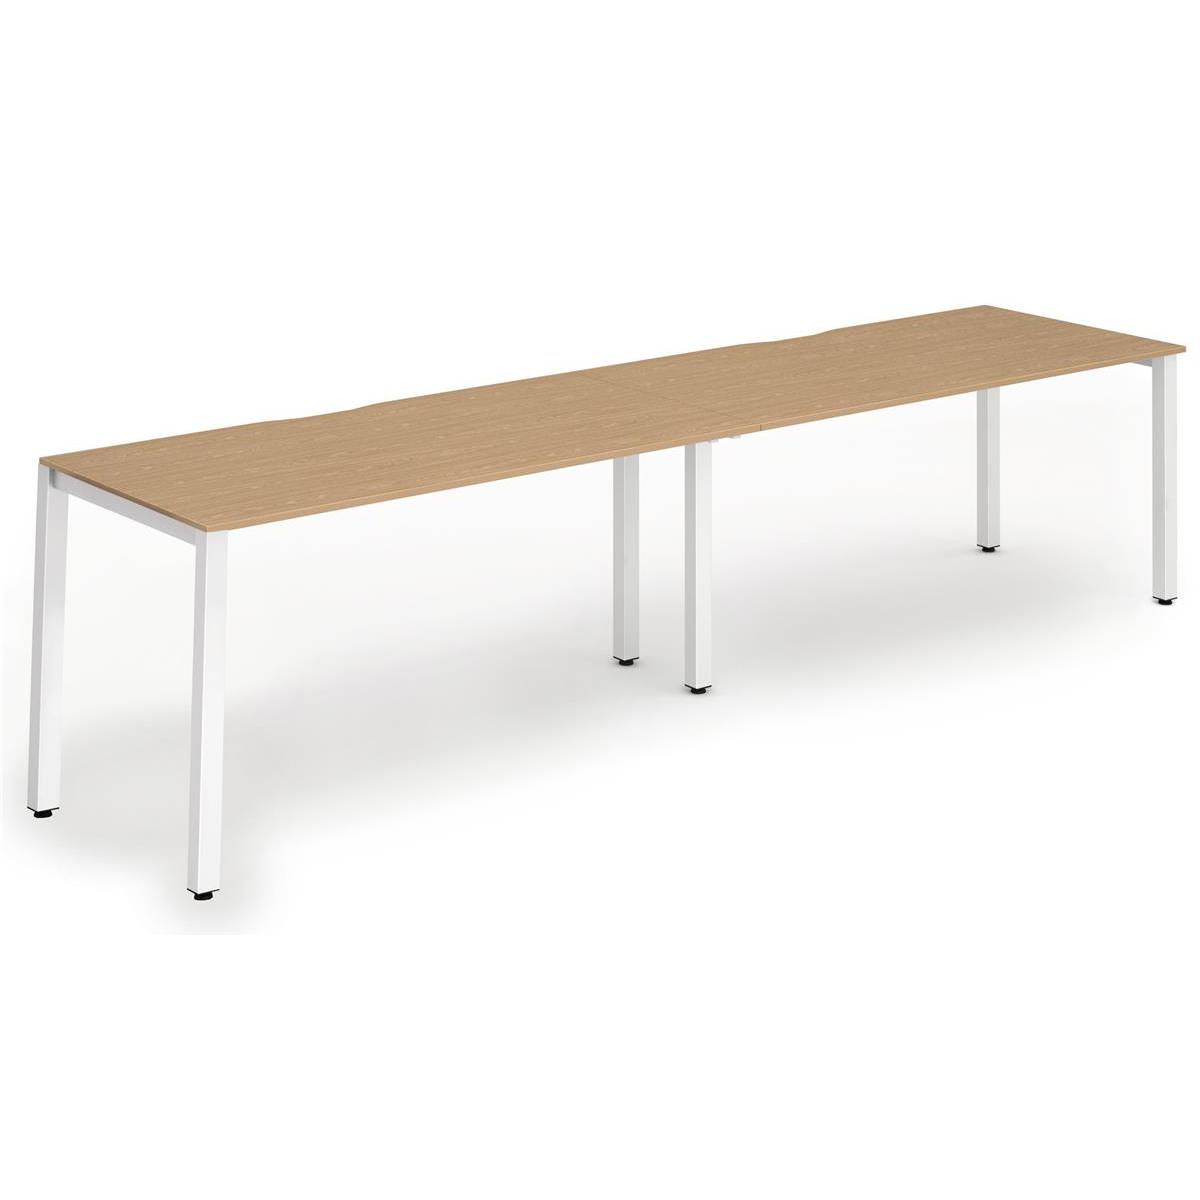 Trexus Bench Desk 2 Person Side to Side Configuration White Leg 2400x800mm Oak Ref BE358